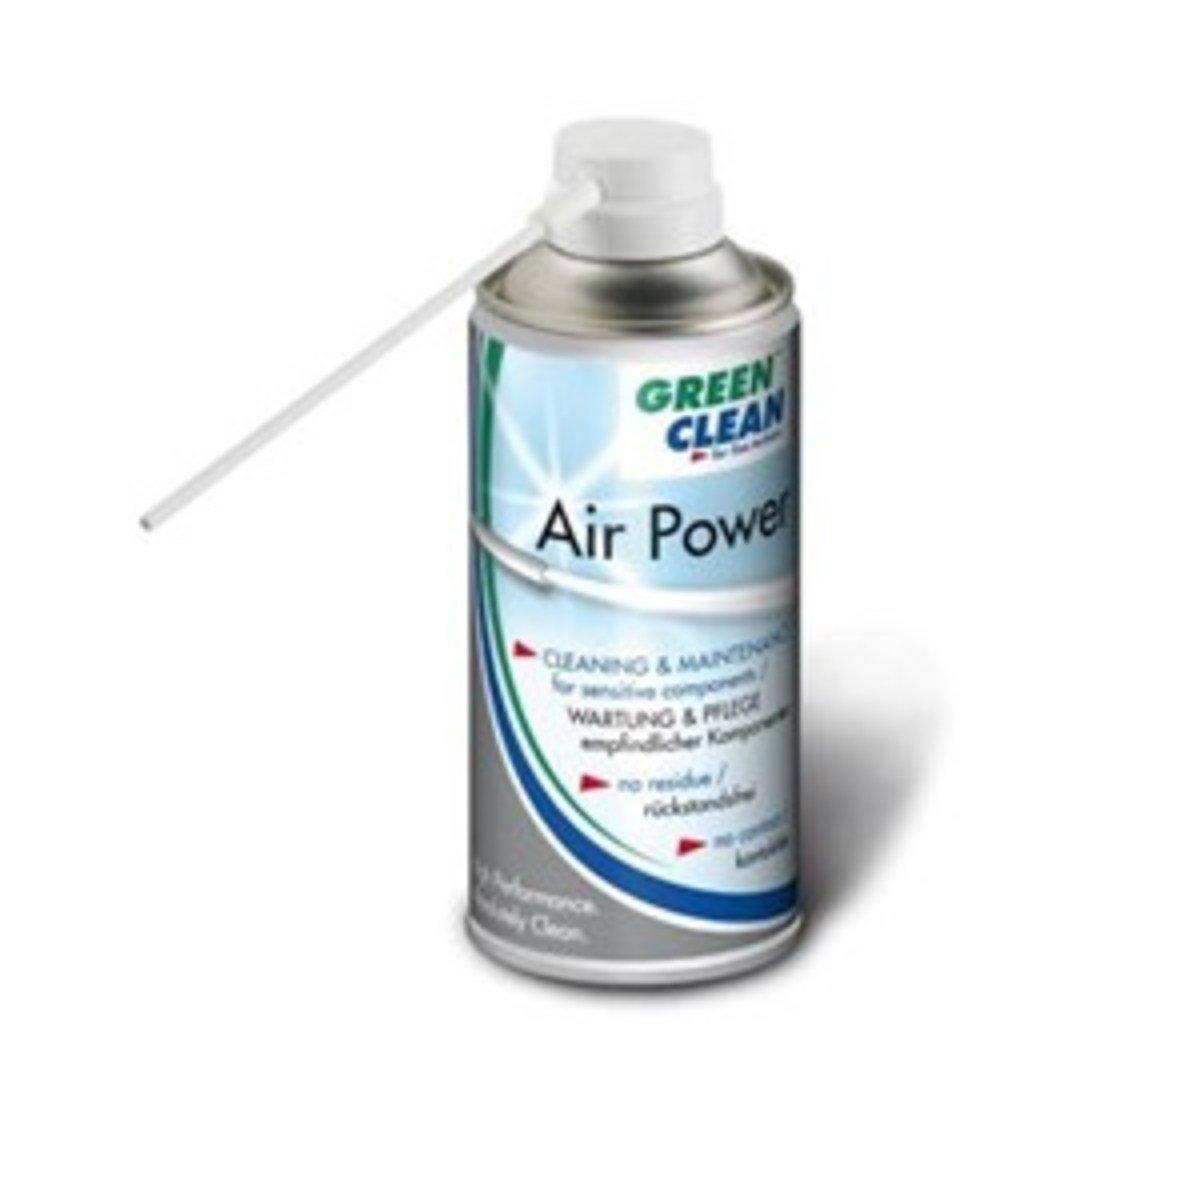 G-2025 Air Power 高壓清潔除塵吹氣罐 (連噴嘴)